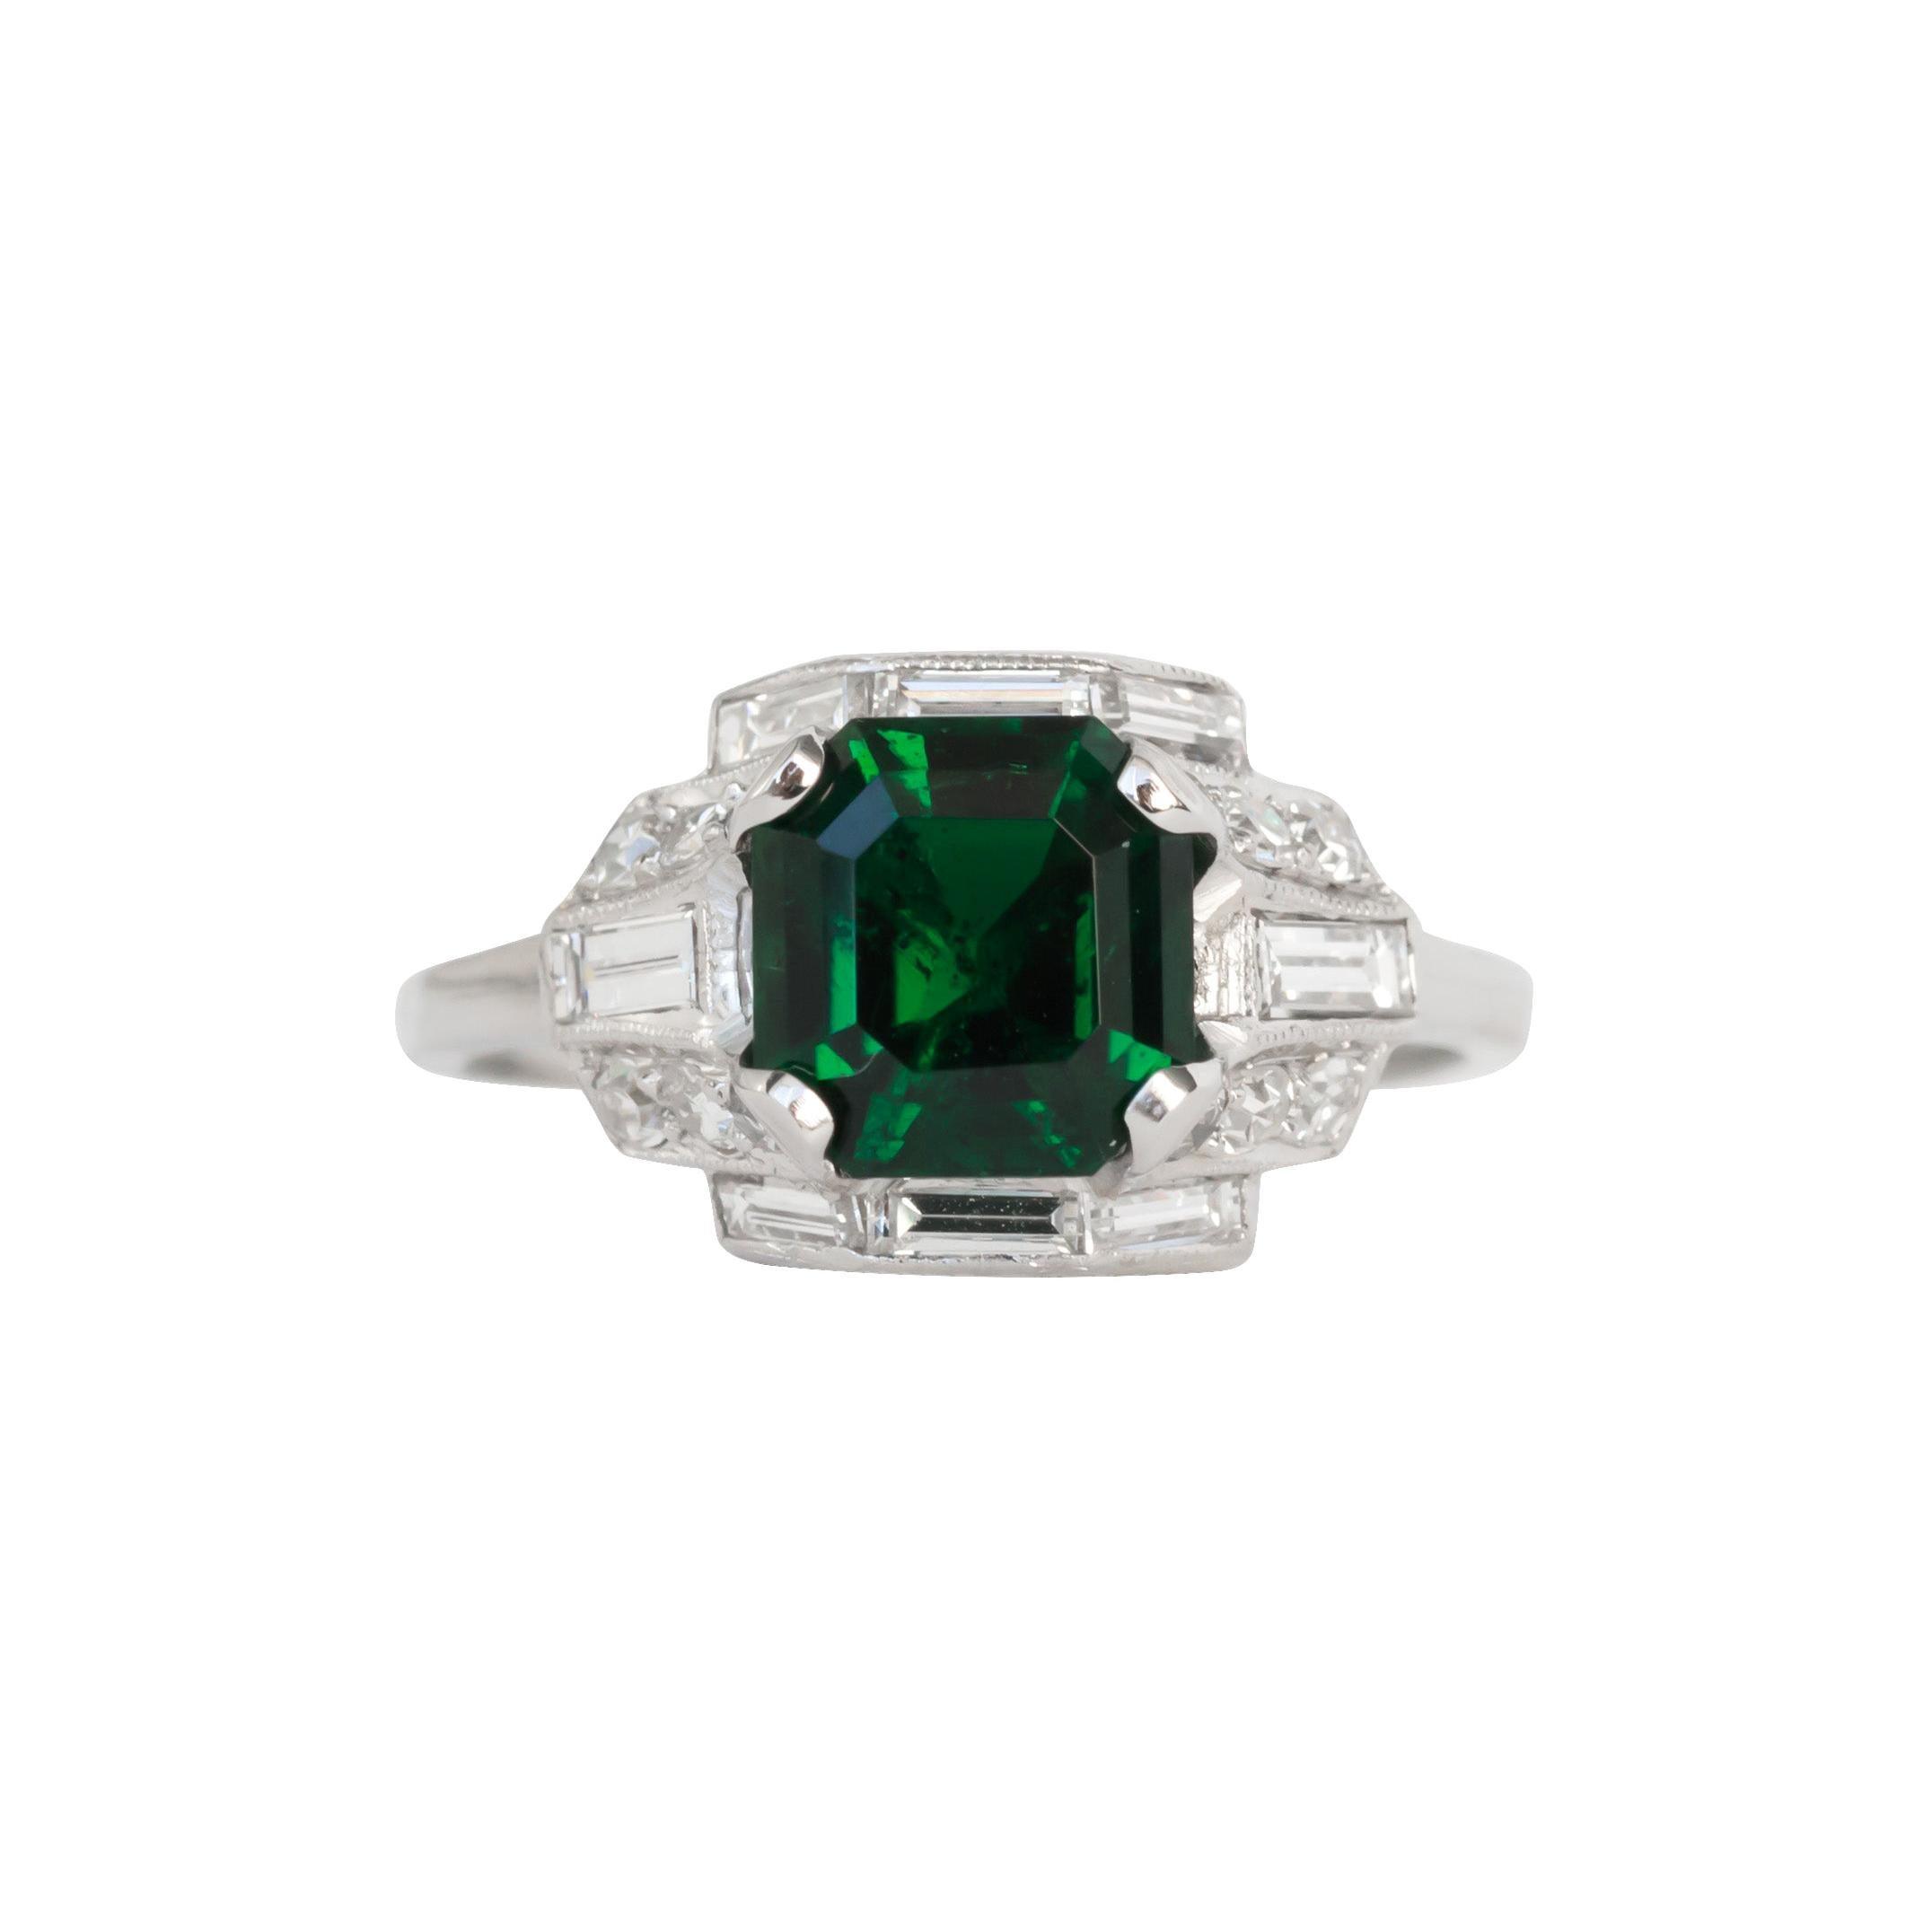 GIA Certified 2.10 Carat Emerald Platinum Engagement Ring, VEG#856A